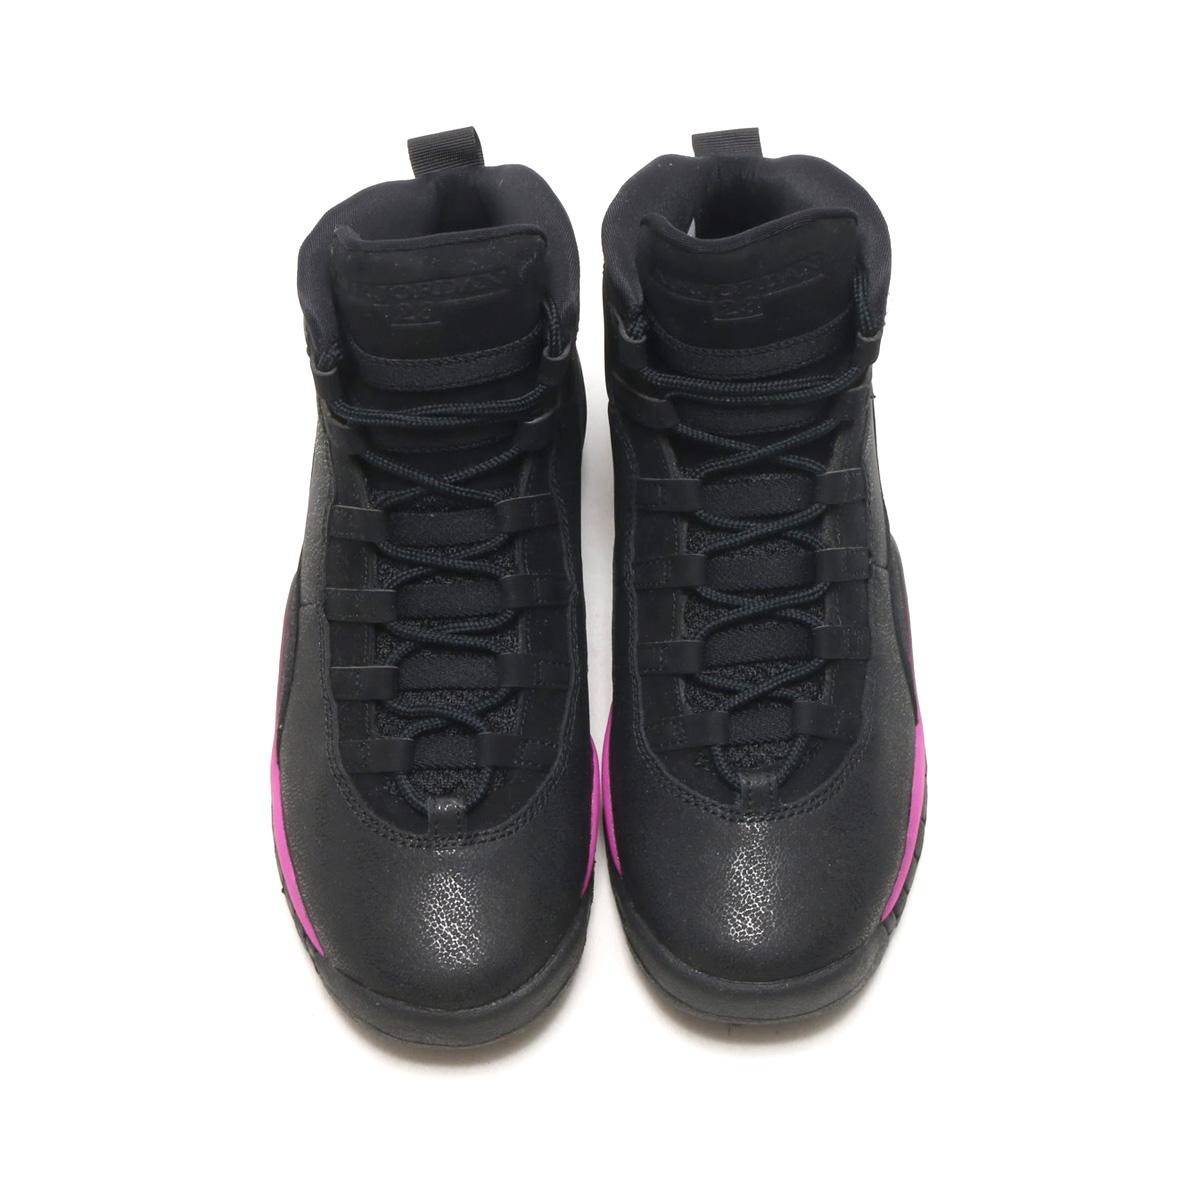 295eef0c9390 NIKE AIR JORDAN 10 RETRO GG (BLACK FUCHSIA BLAST-BLACK) (Nike Air Jordan 10  nostalgic GG)